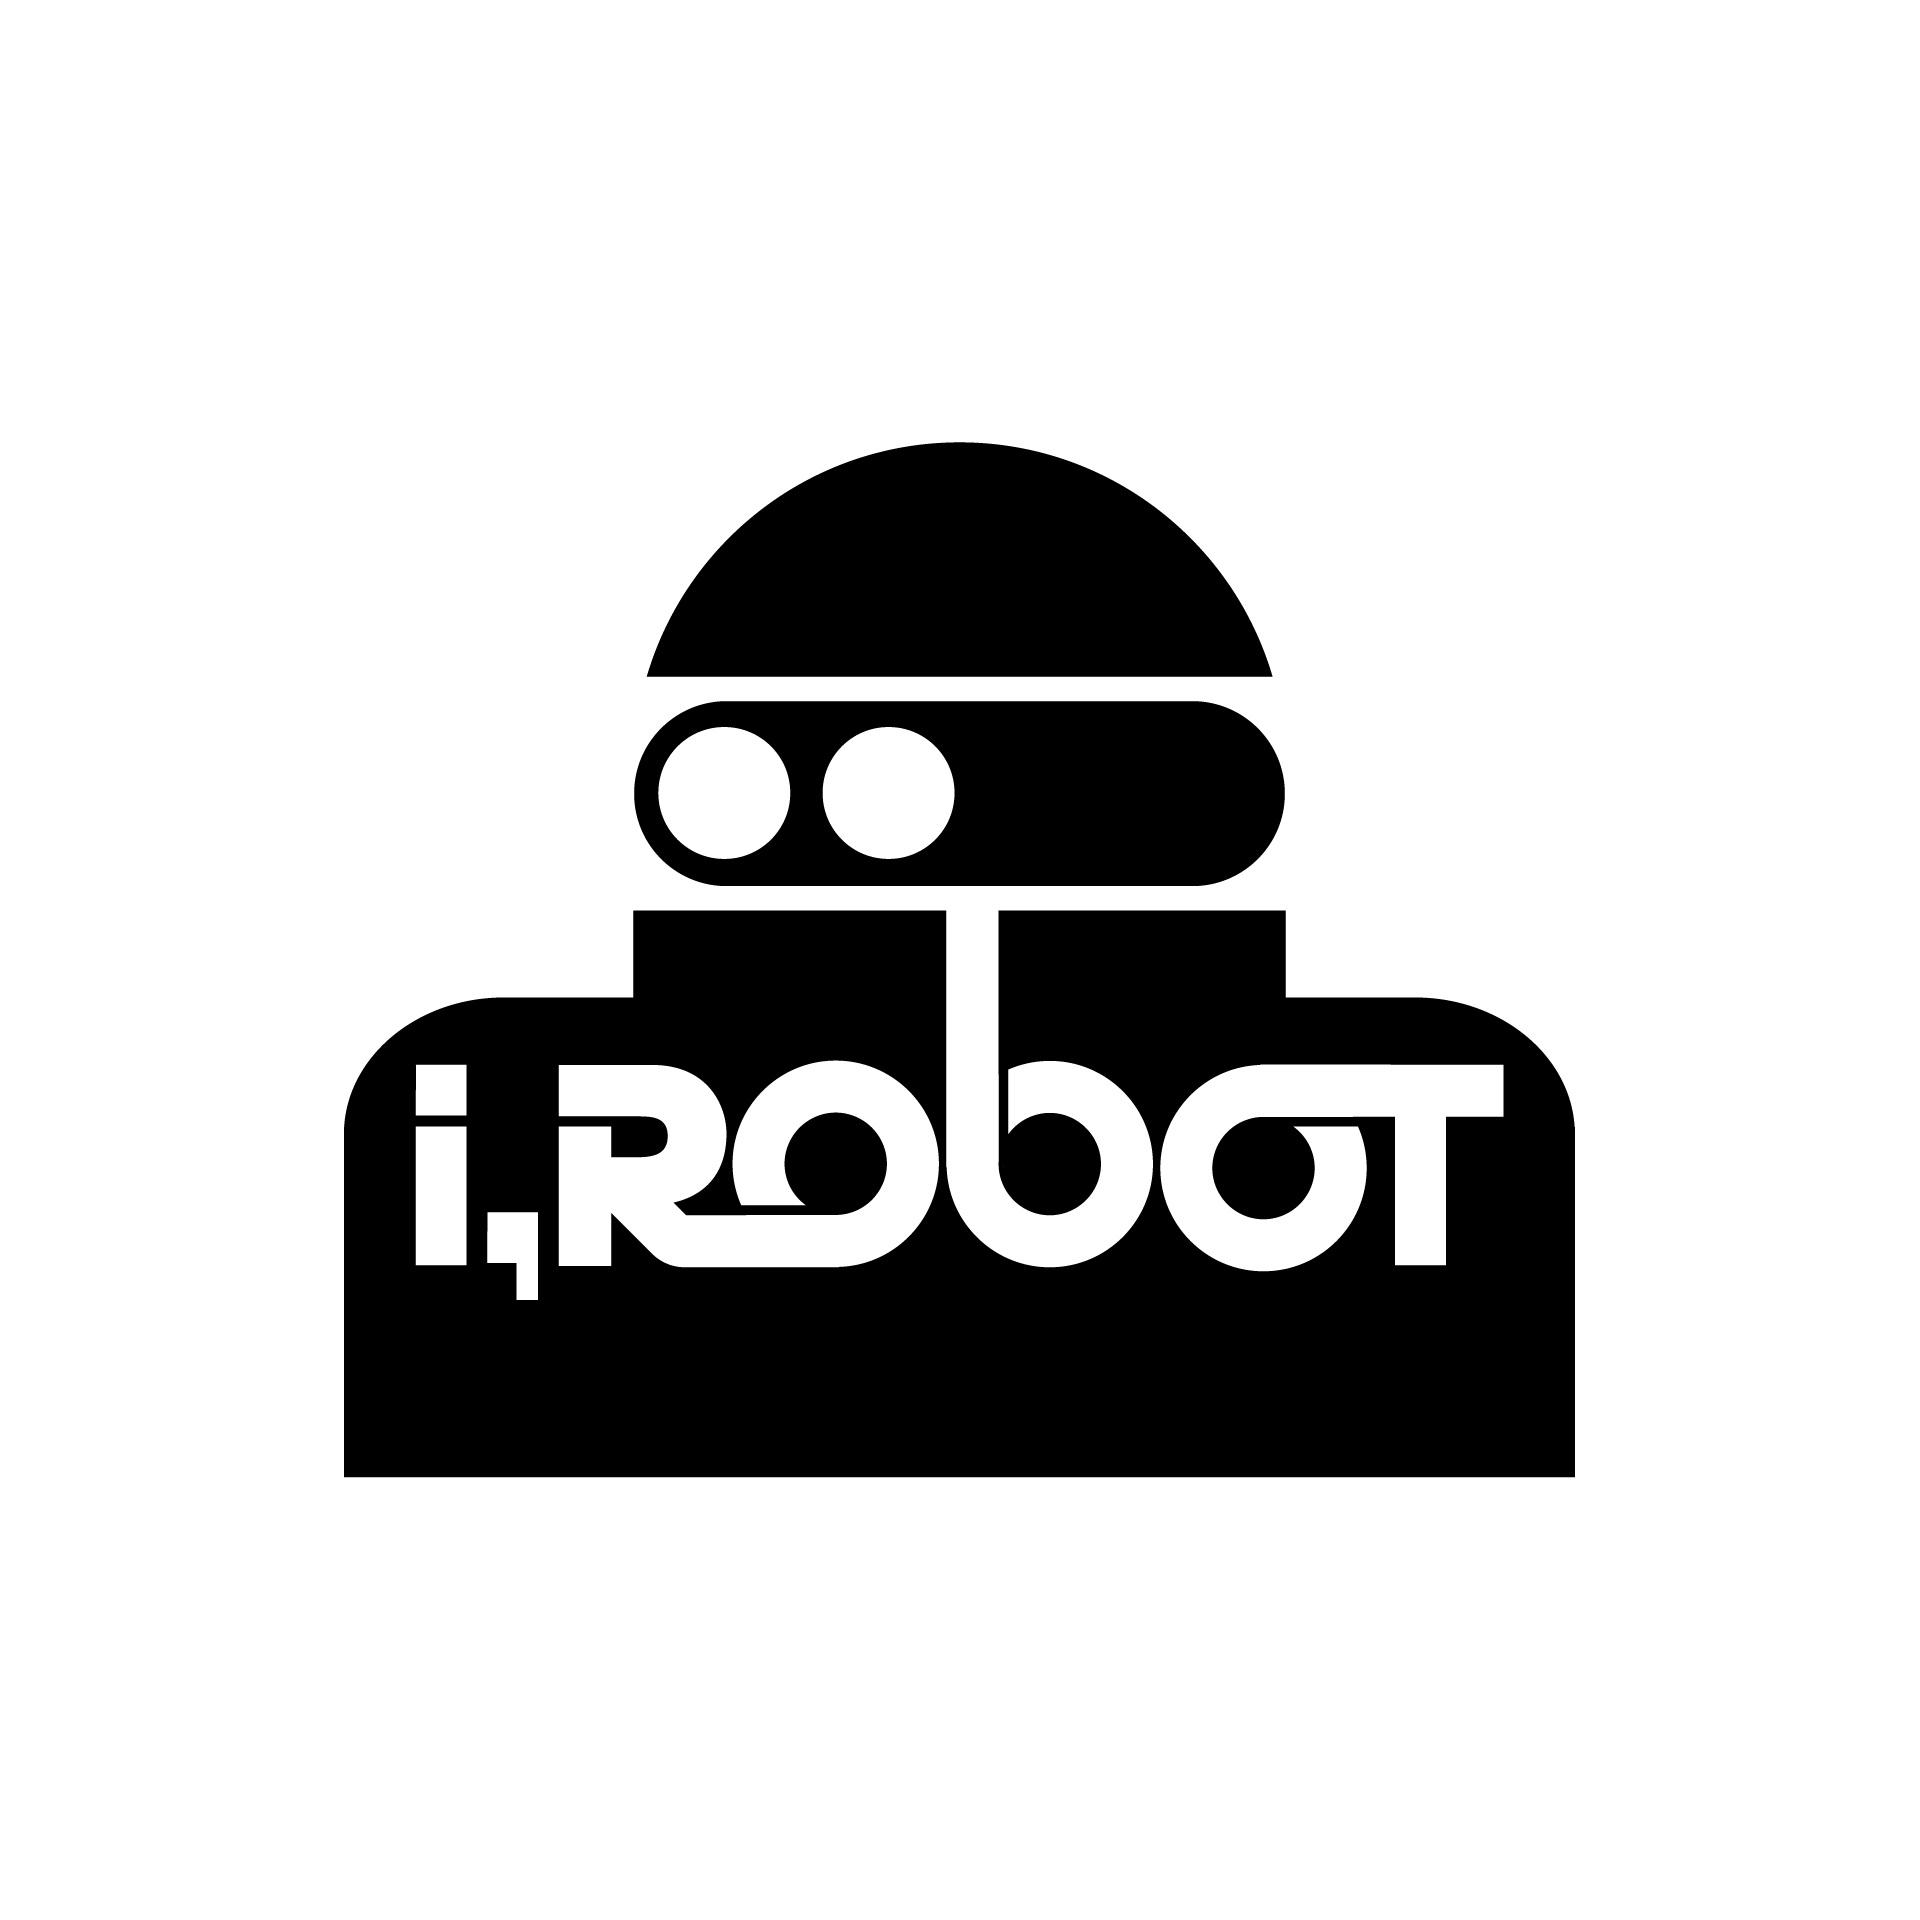 iRobot_NickJr_Justin-Harder.png